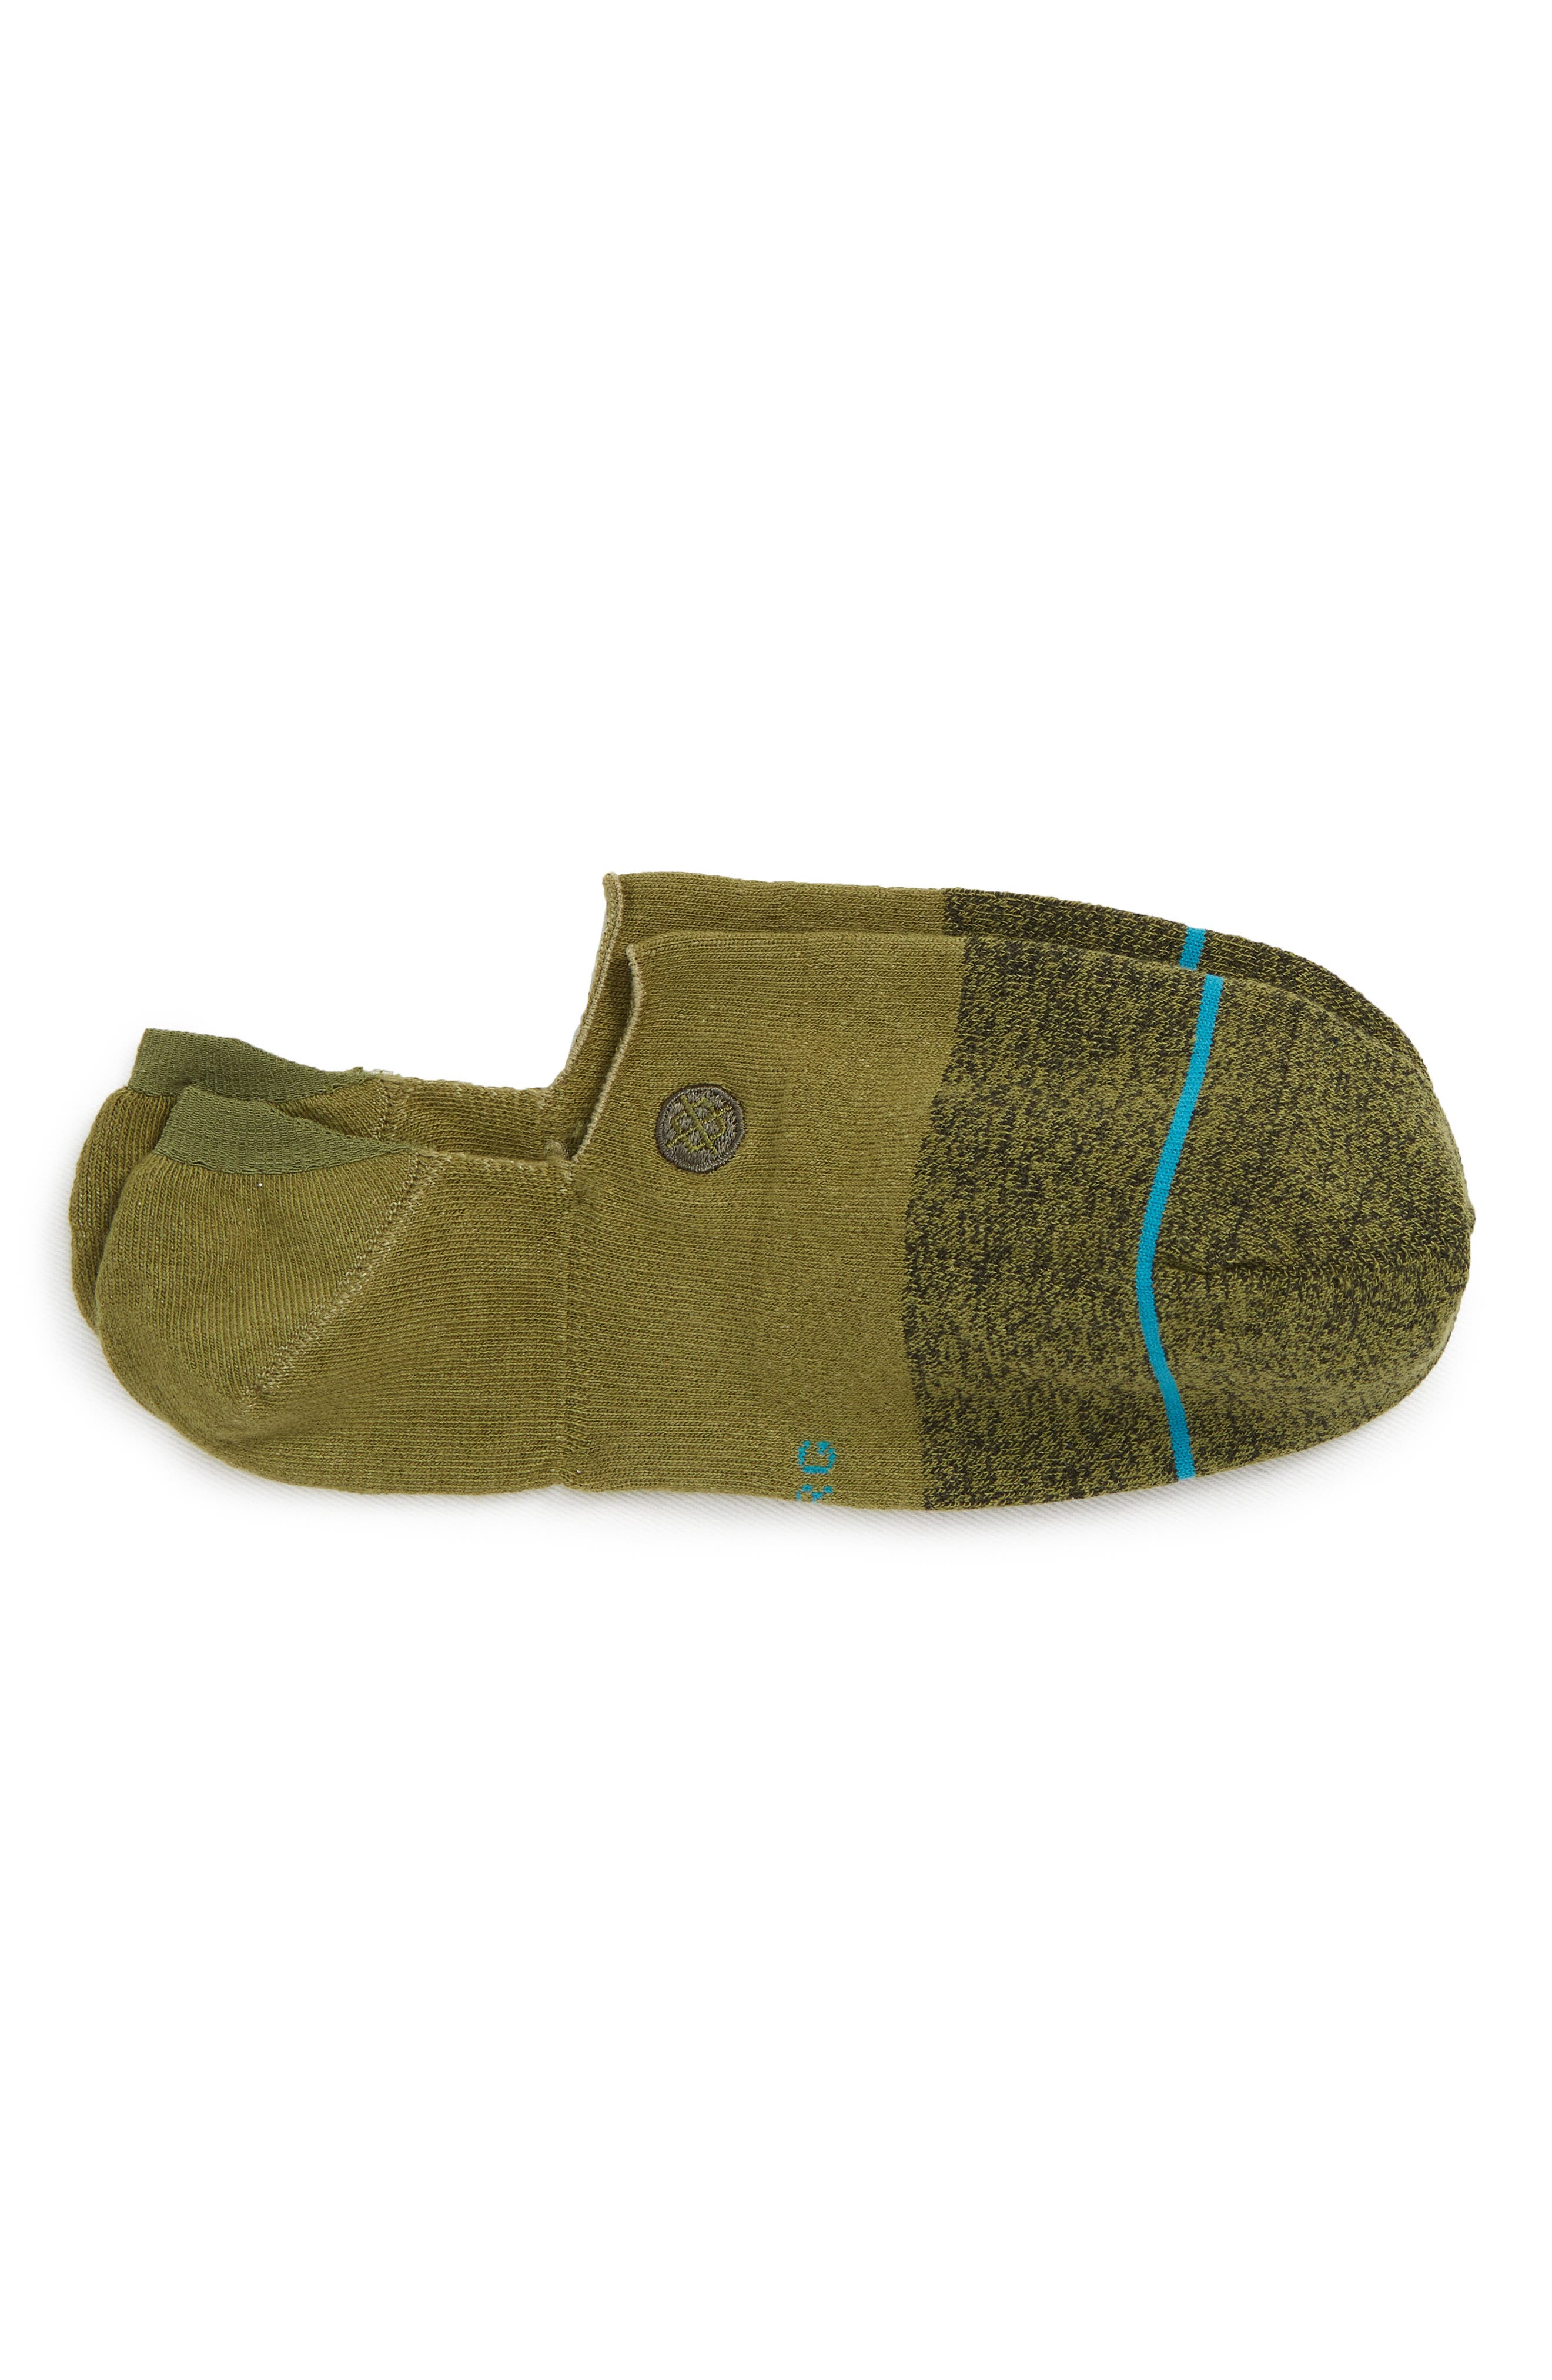 Gamut Liner Socks,                             Main thumbnail 1, color,                             OLIVE